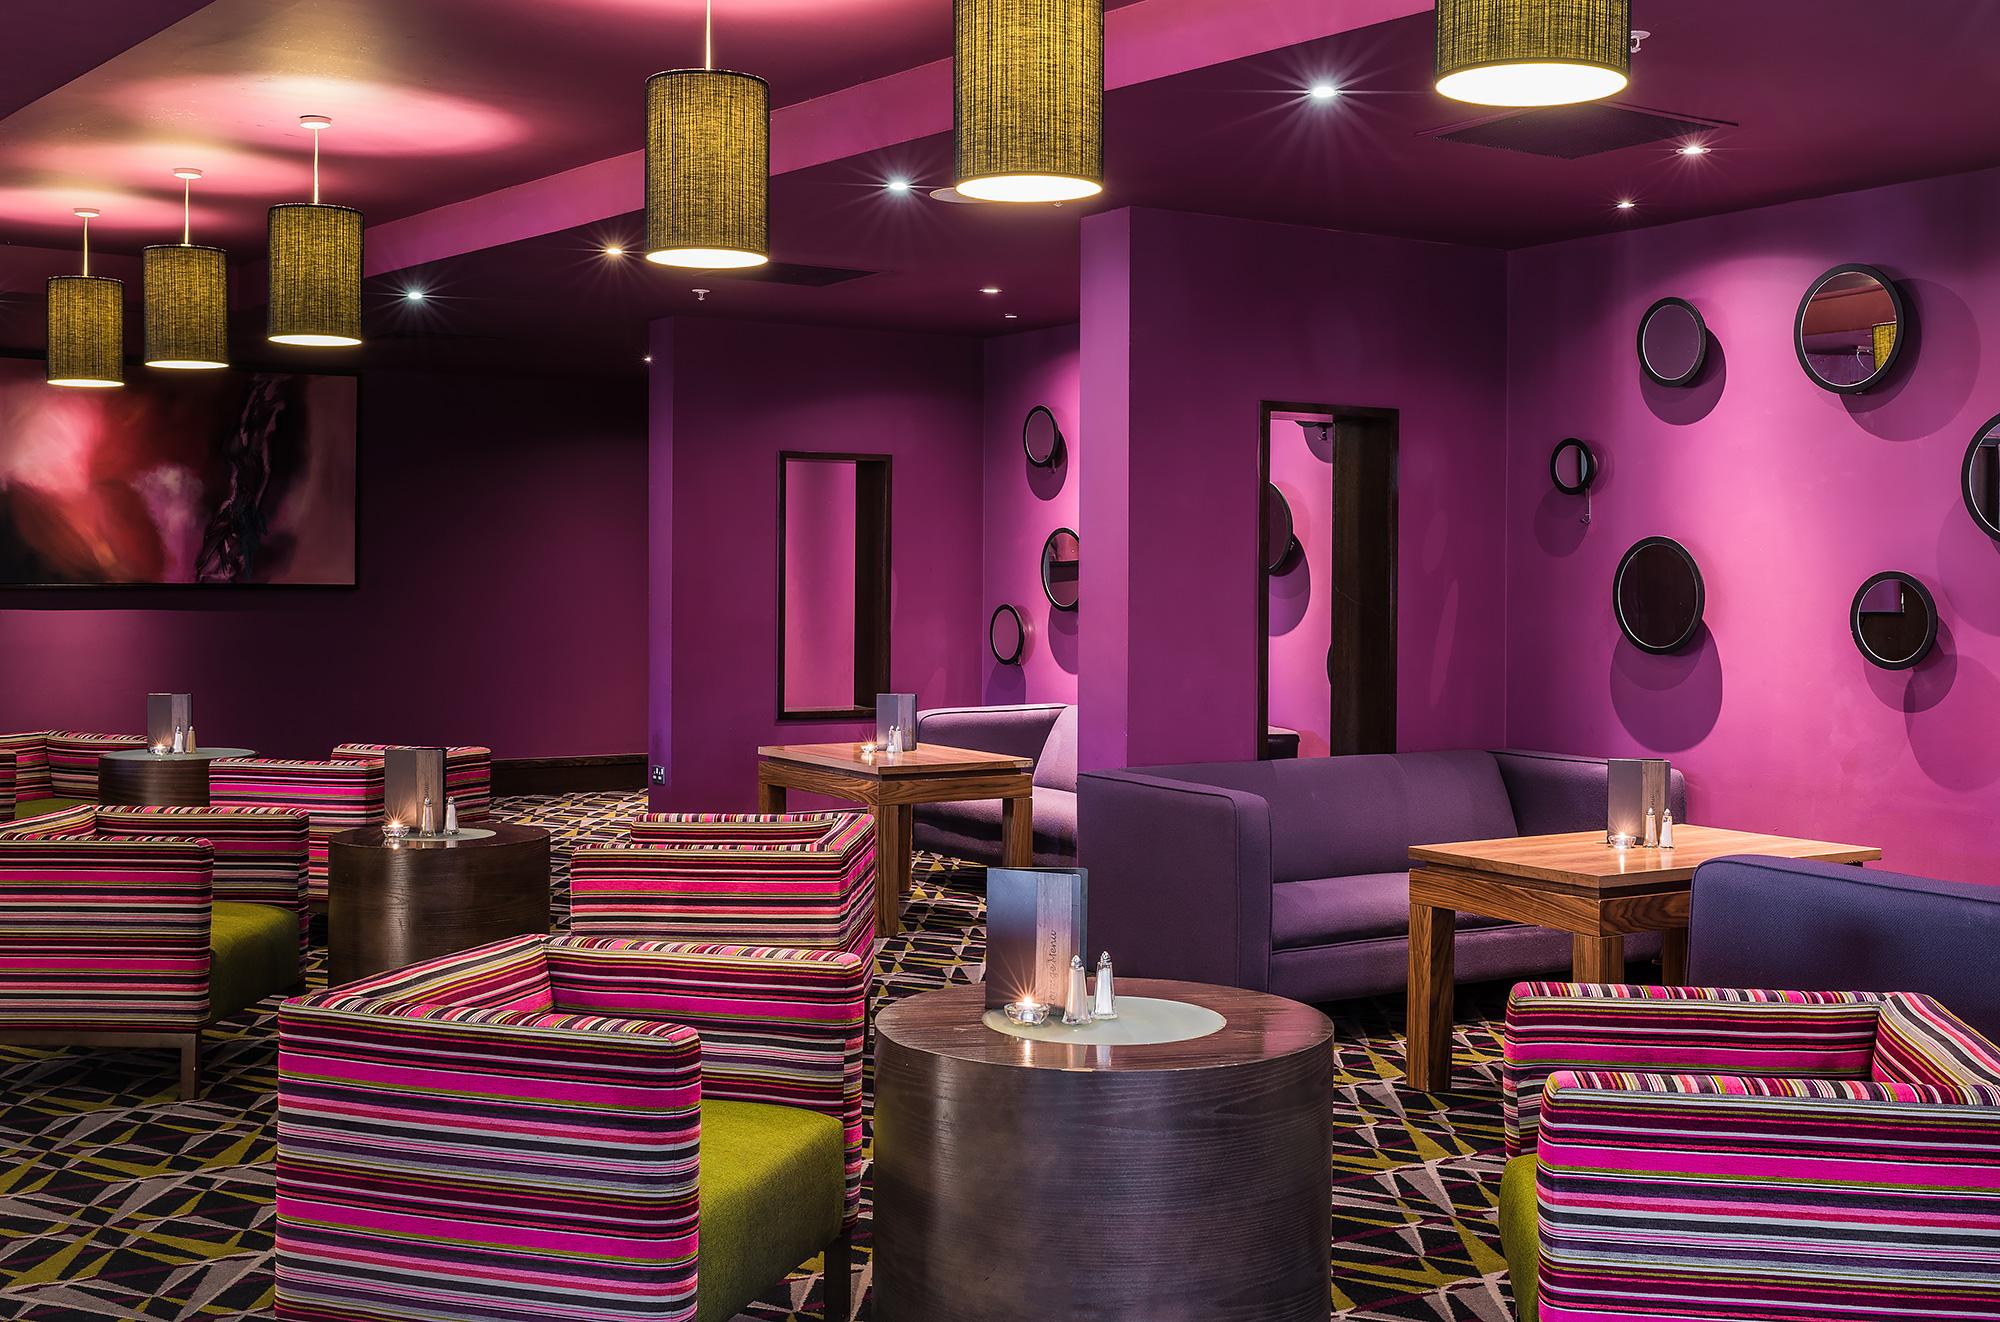 hotel-bar-area.jpg